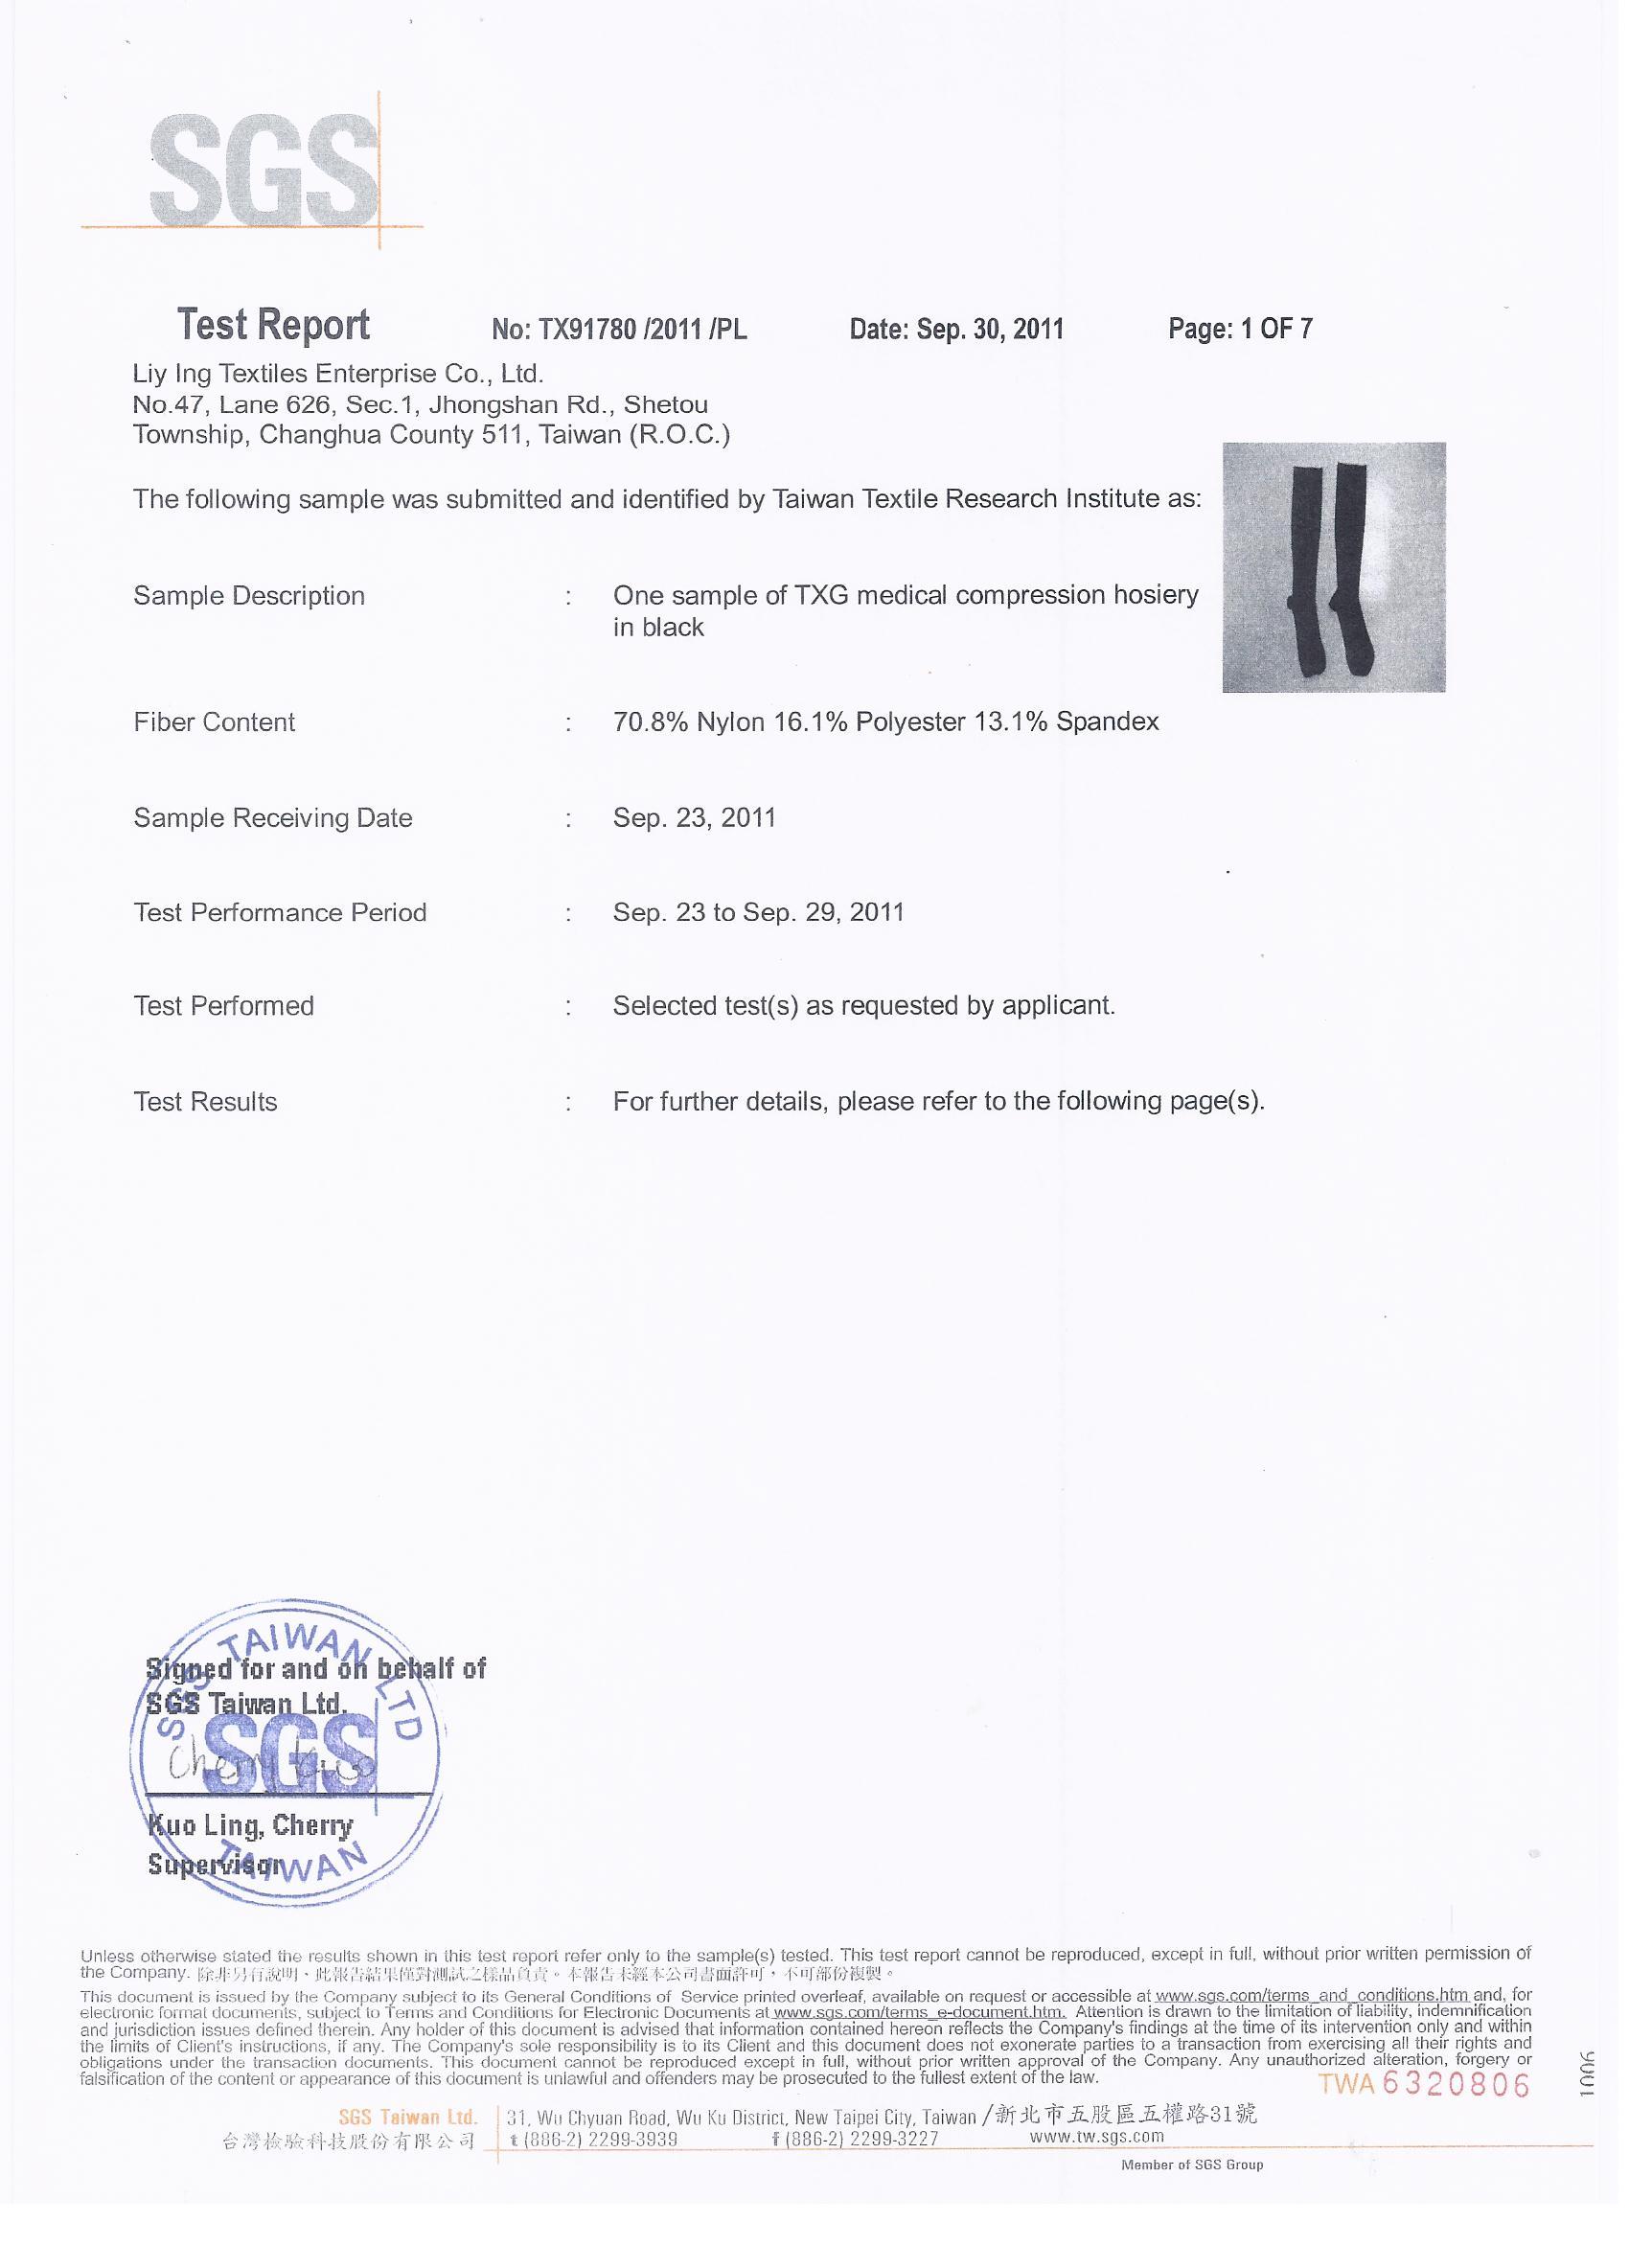 TXG機能減壓襪 SGS安全檢驗